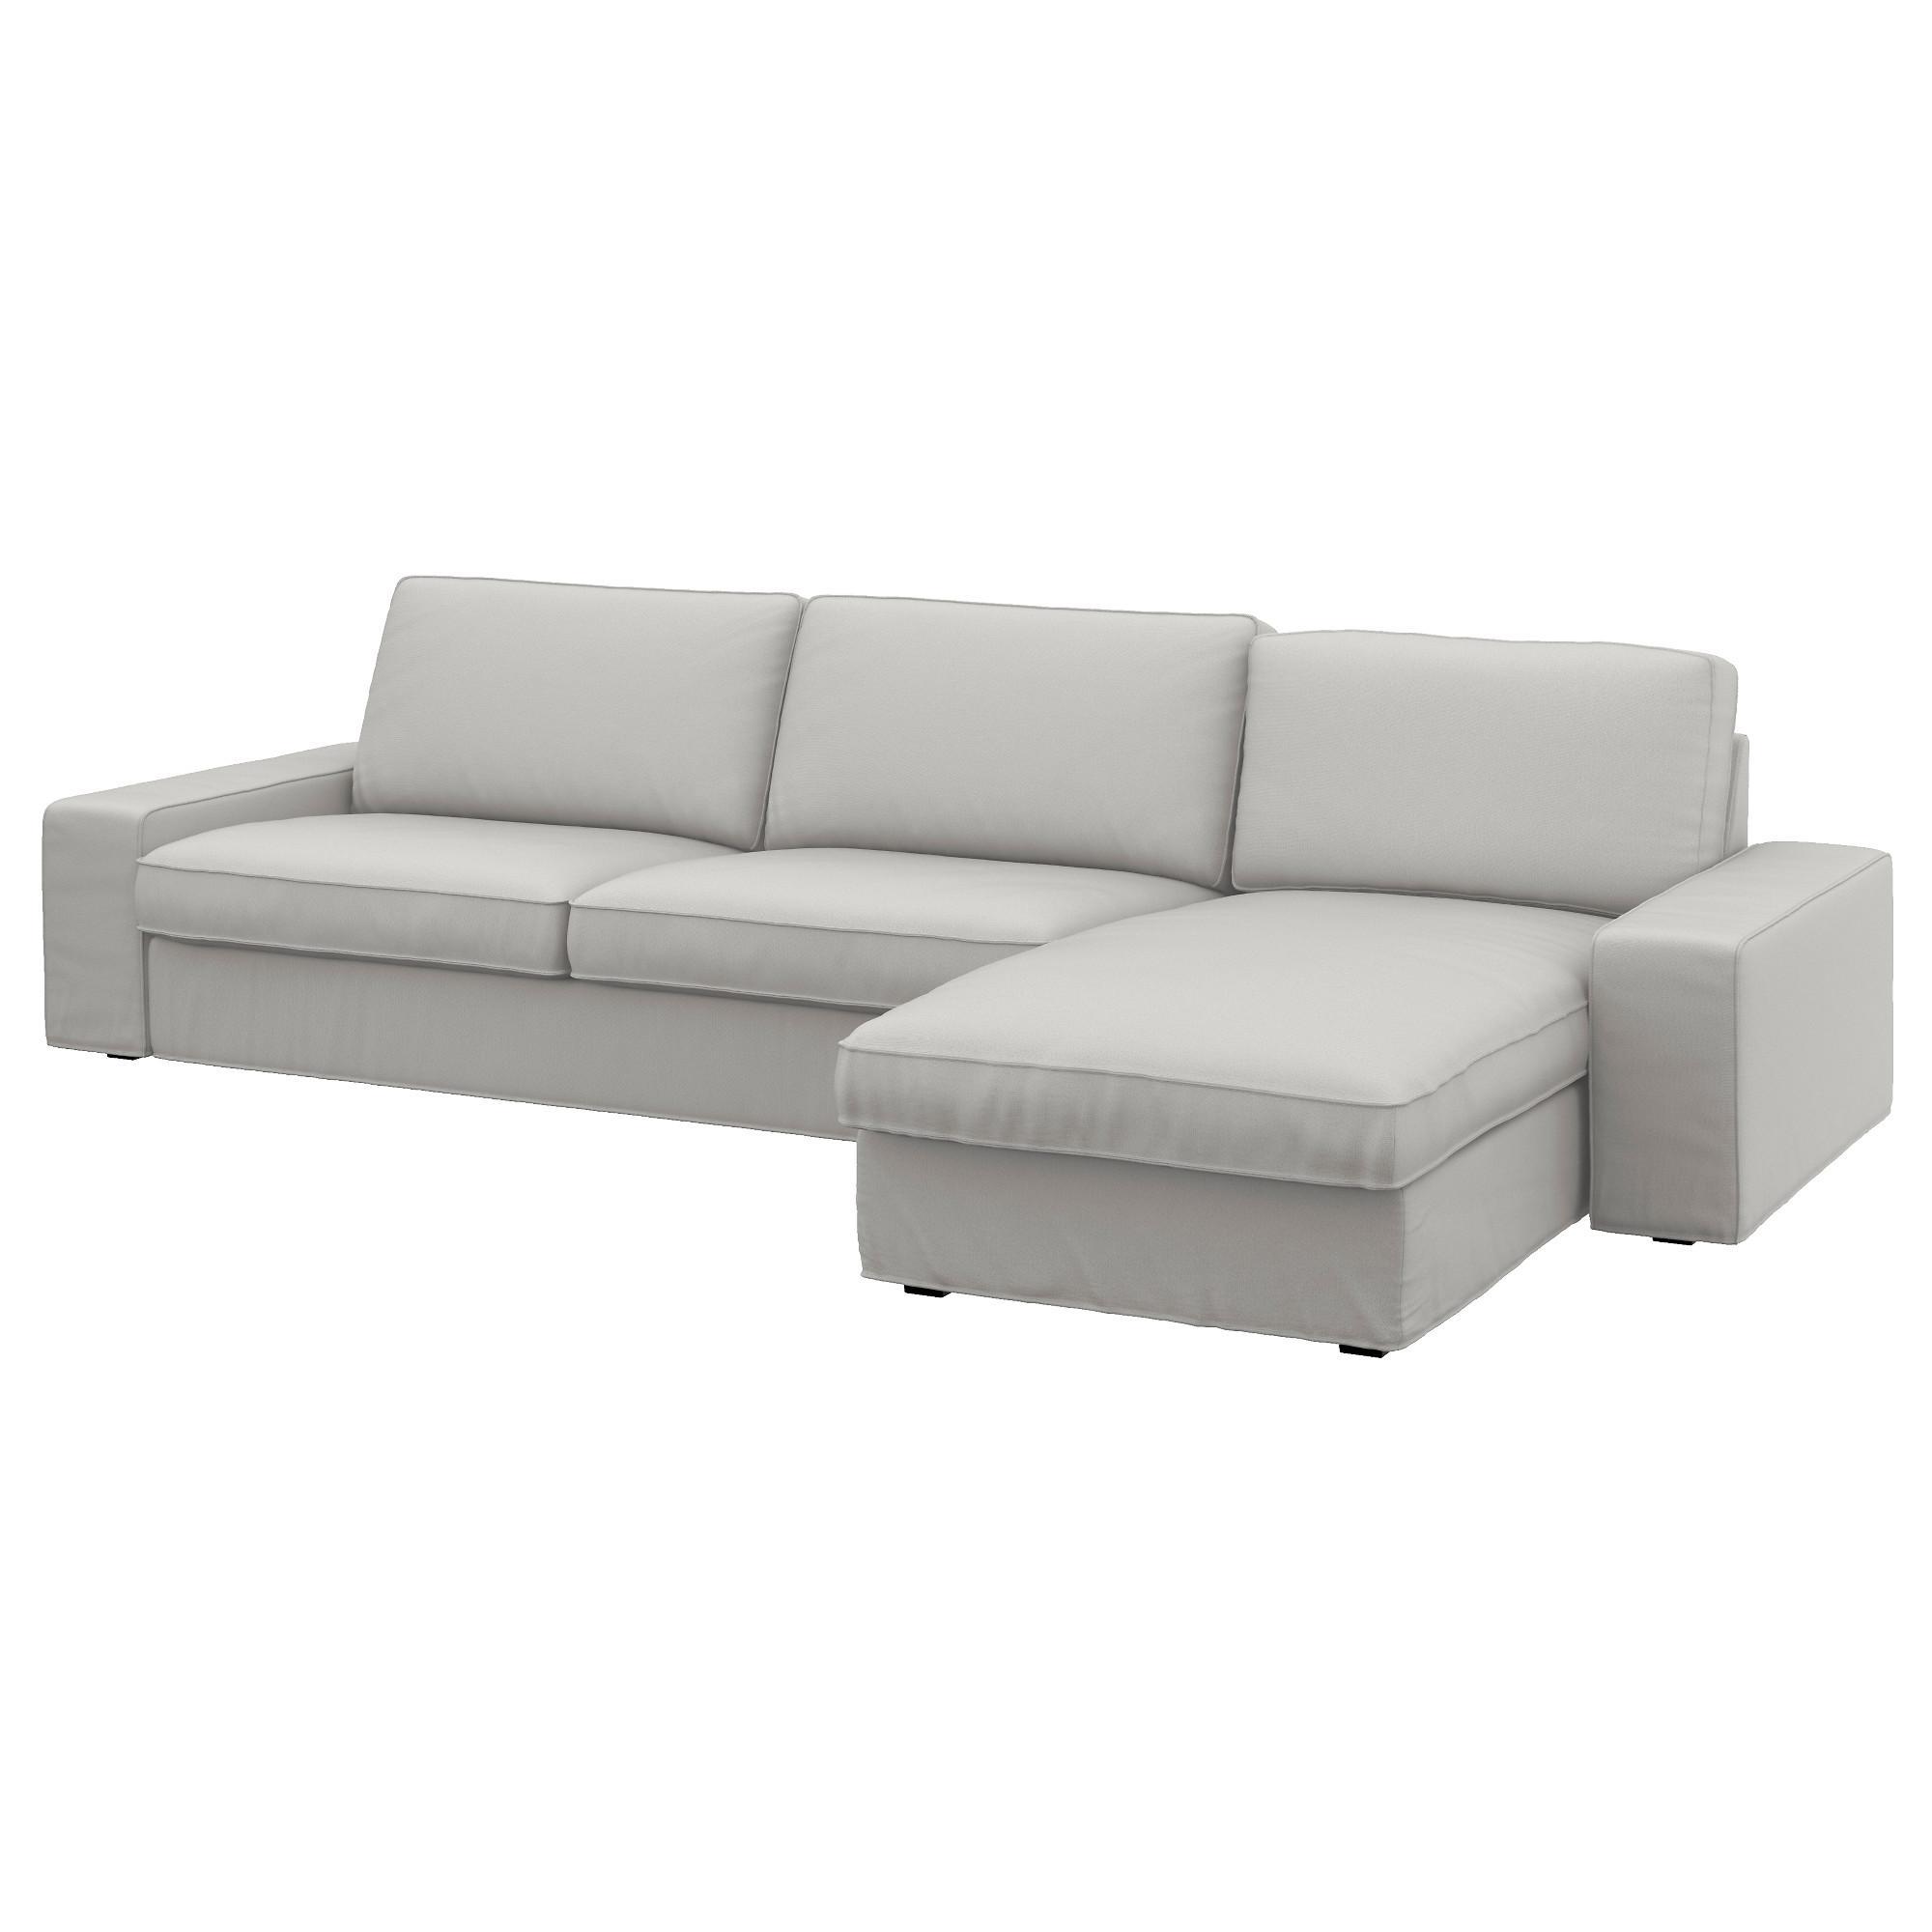 Kivik 4 Seat Sofa With Chaise Longue/ramna Light Grey – Ikea Intended For Sofas With Chaise Longue (Image 8 of 20)